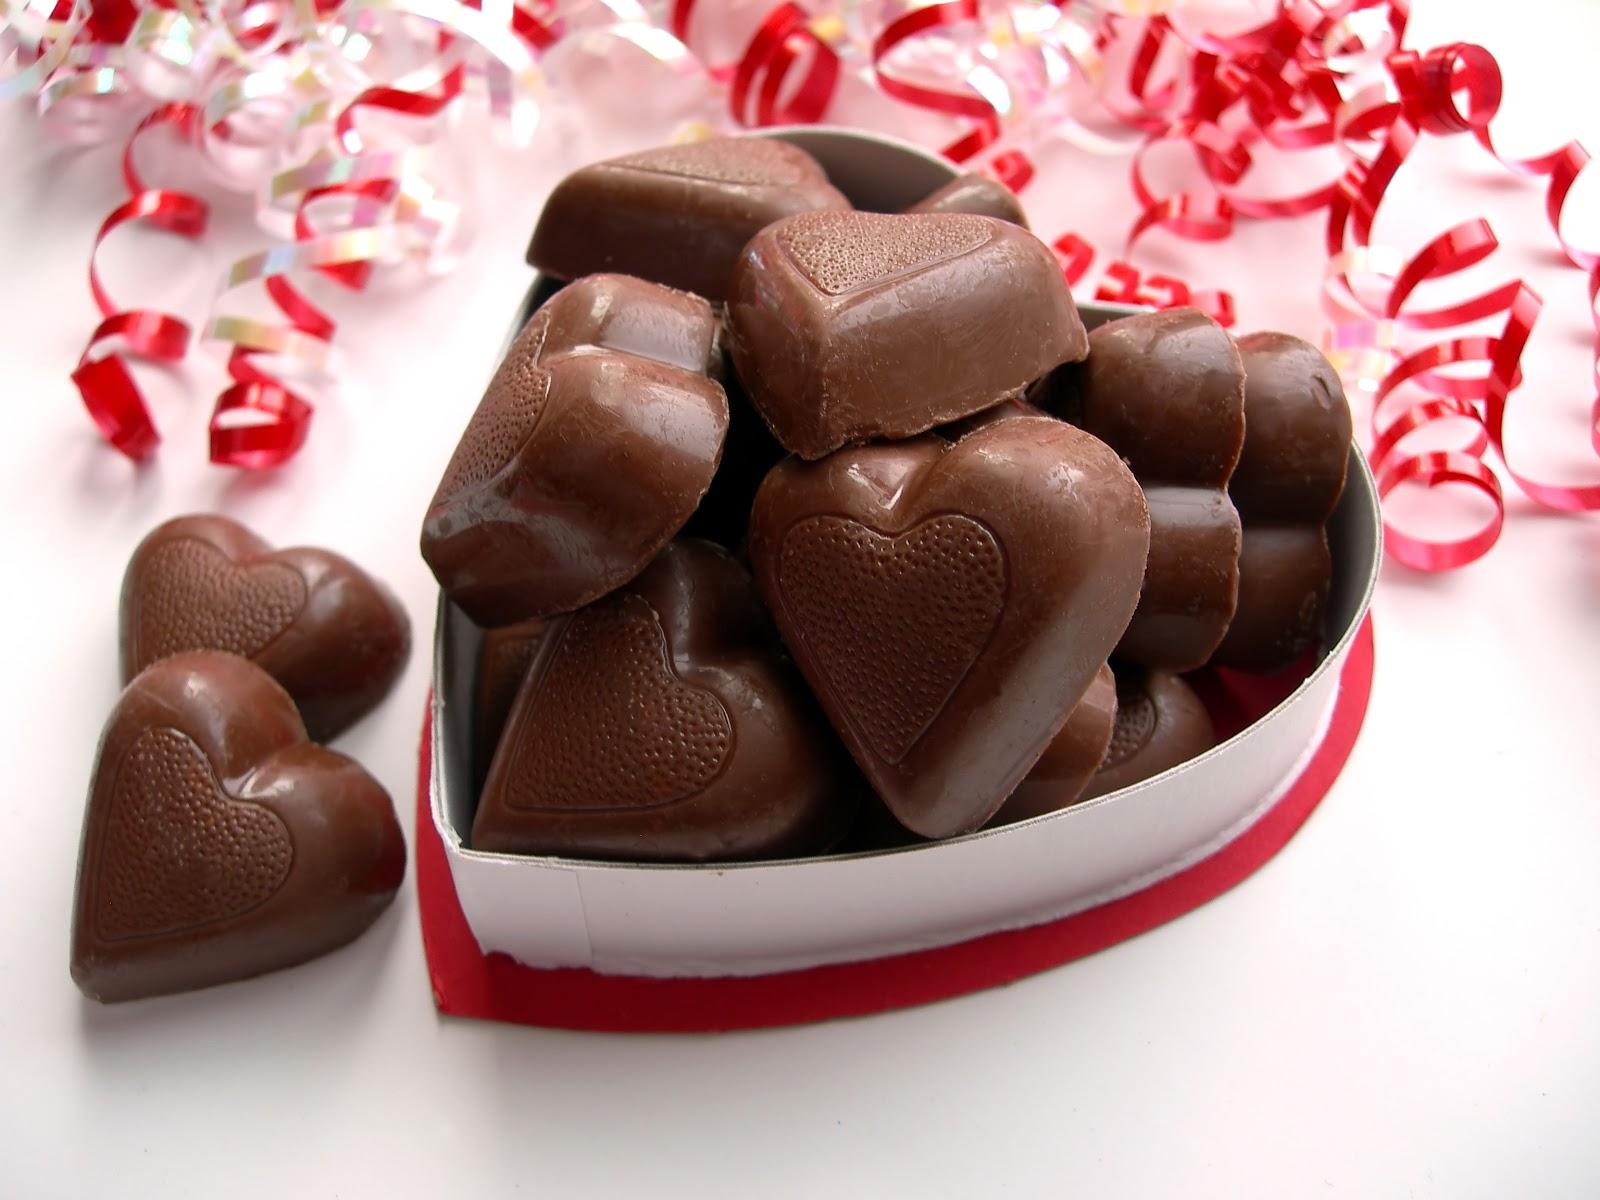 hinh-anh-dep-keo-socola-cho-ngay-le-valentine-14-2-2016-7